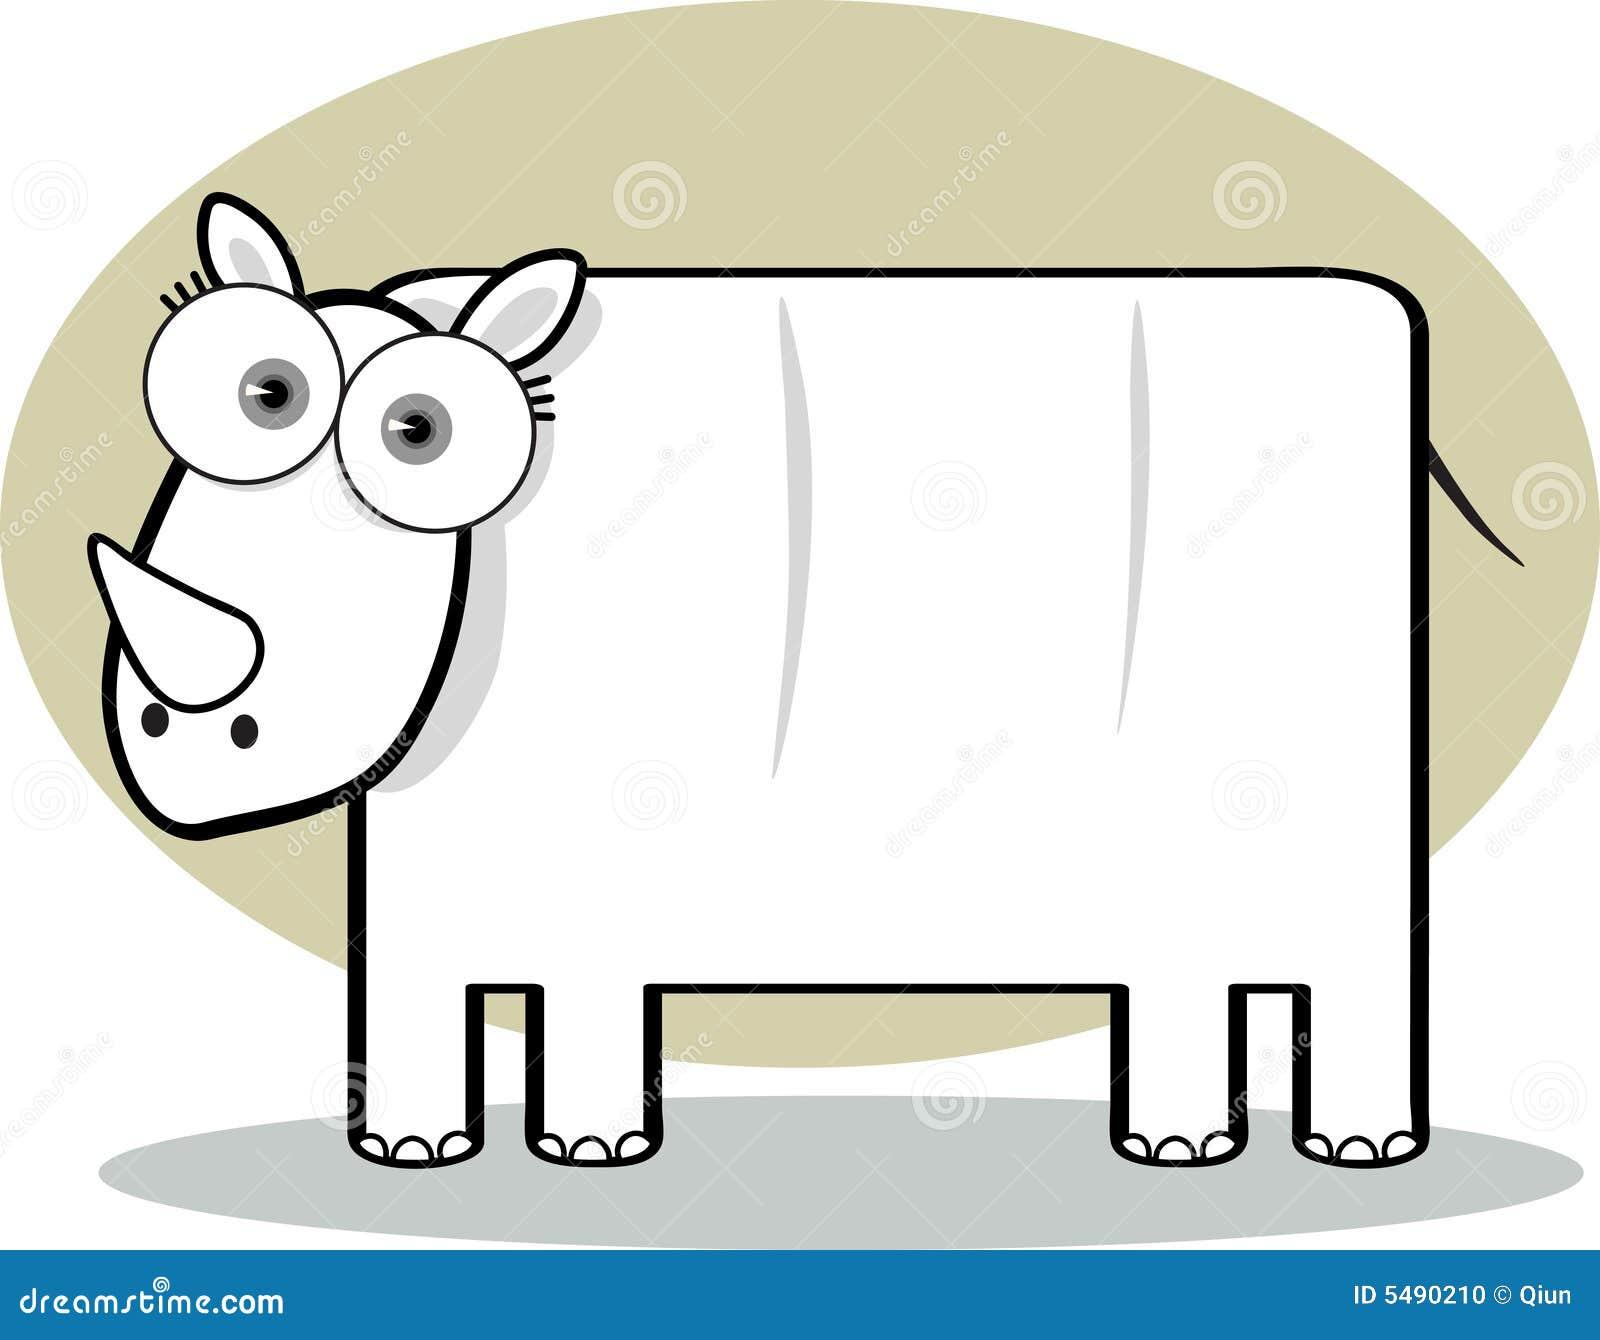 Dessin Anim Noir Et Blanc: Rhinocéros De Dessin Animé En Noir Et Blanc Photo Stock